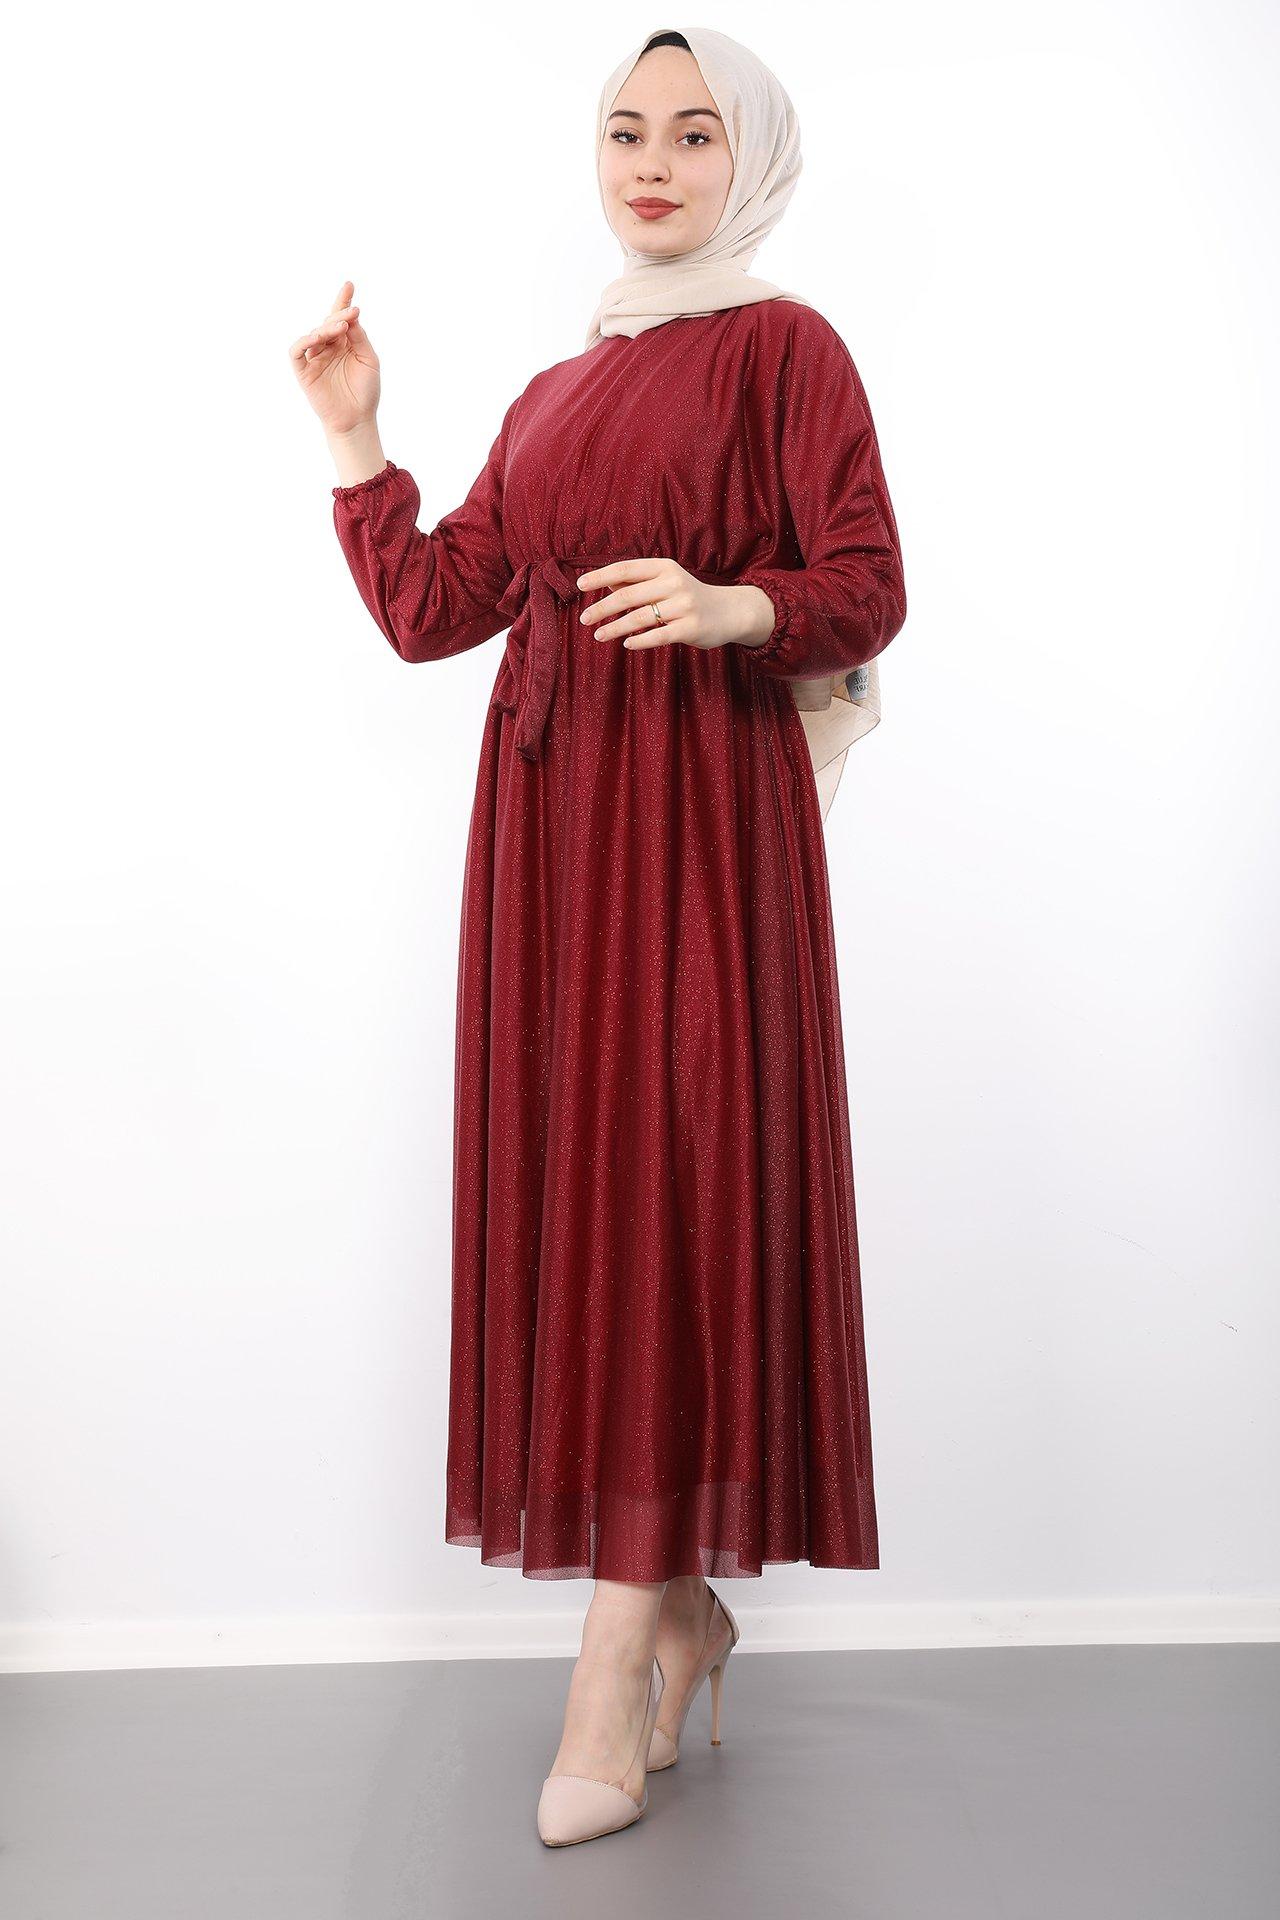 GİZAGİYİM - Giza Simli Şifon Elbise Bordo